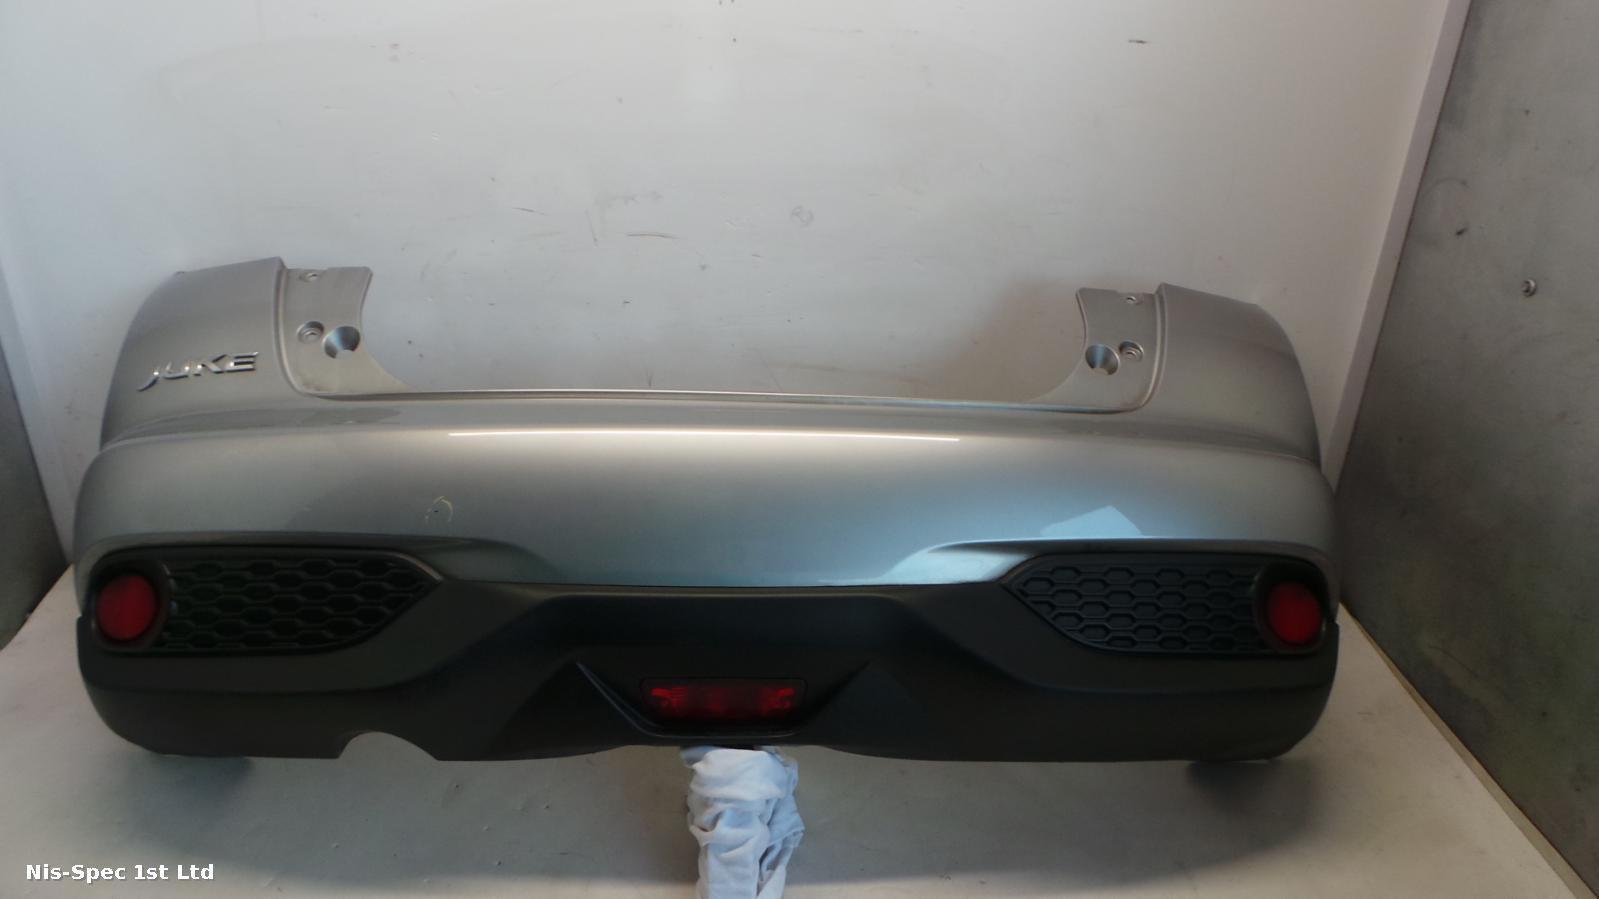 Nissan Juke F15 Rear Bumper